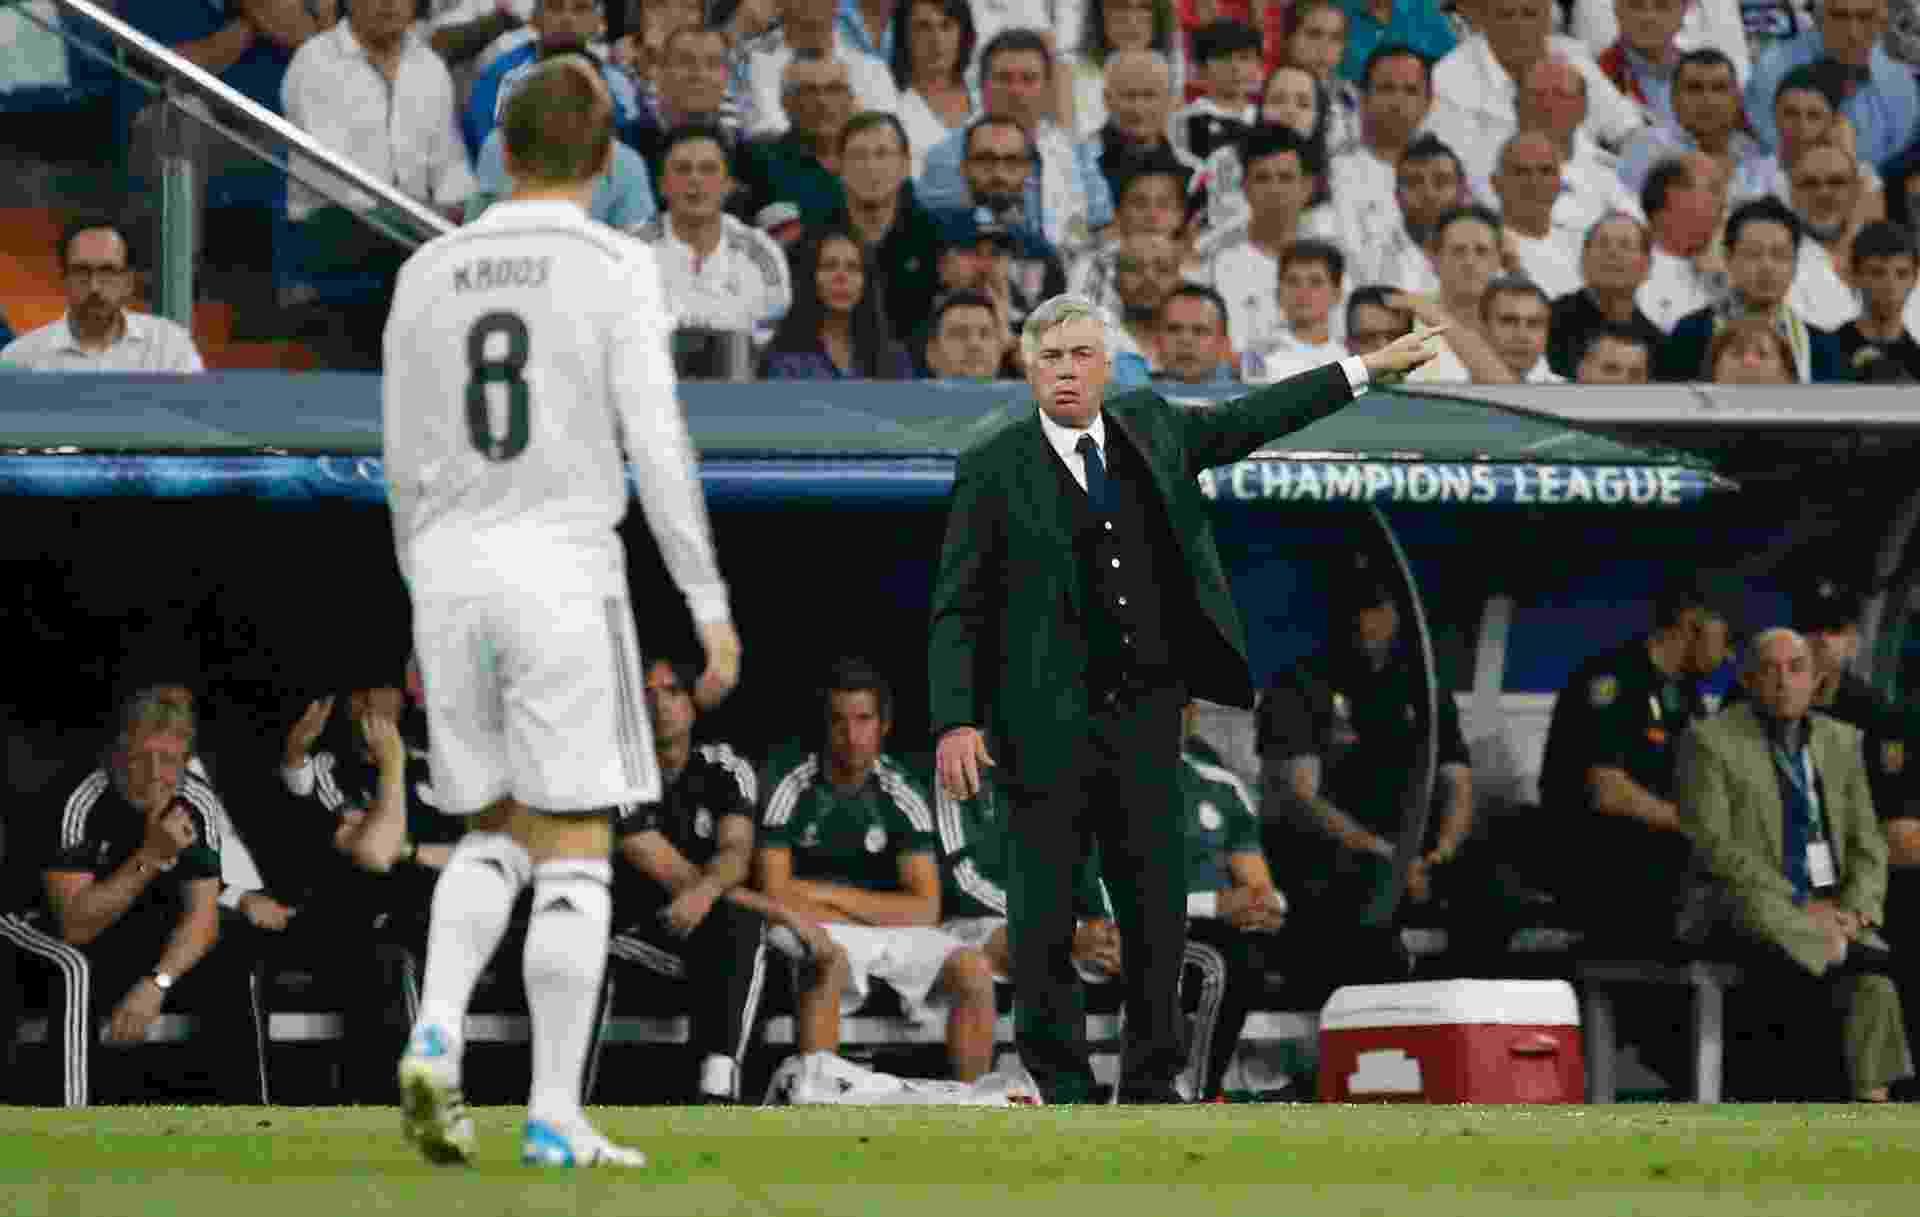 Carlo Ancelotti orienta Toni Kroos durante a partida entre Real Madrid e Juventus - Paul Hanna/Reuters